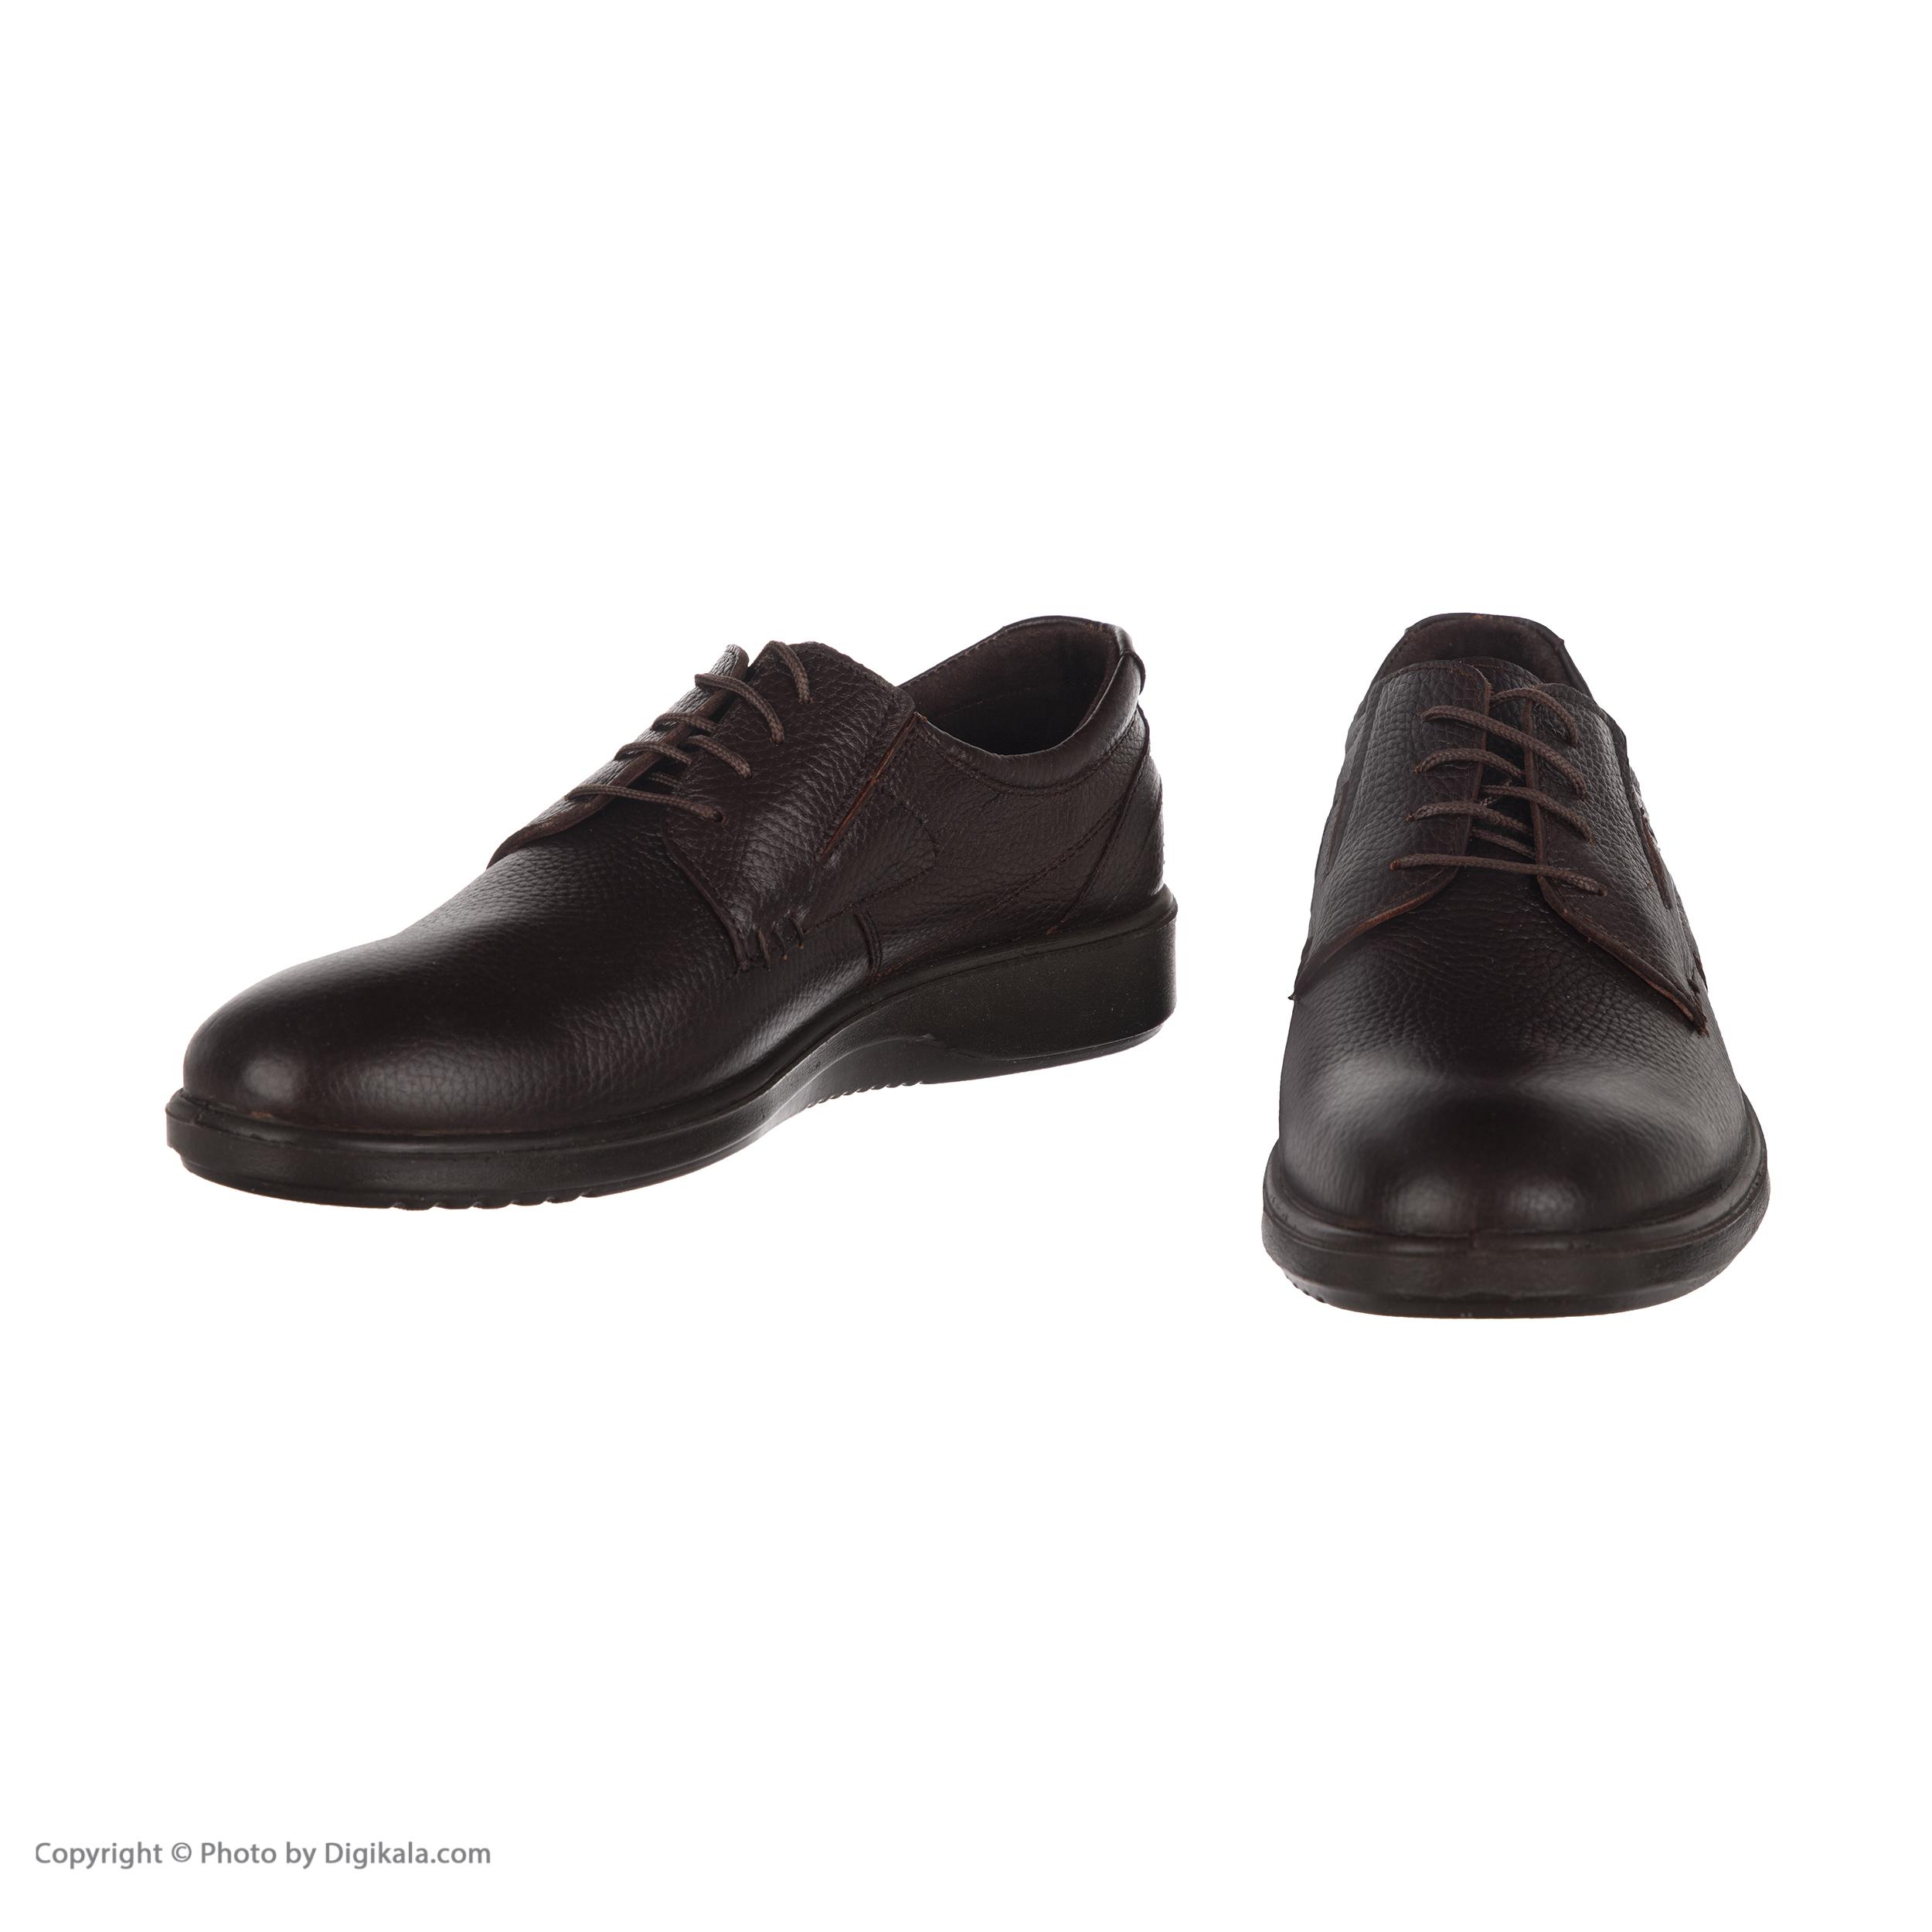 کفش روزمره مردانه آذر پلاس مدل 9438B503104 -  - 6